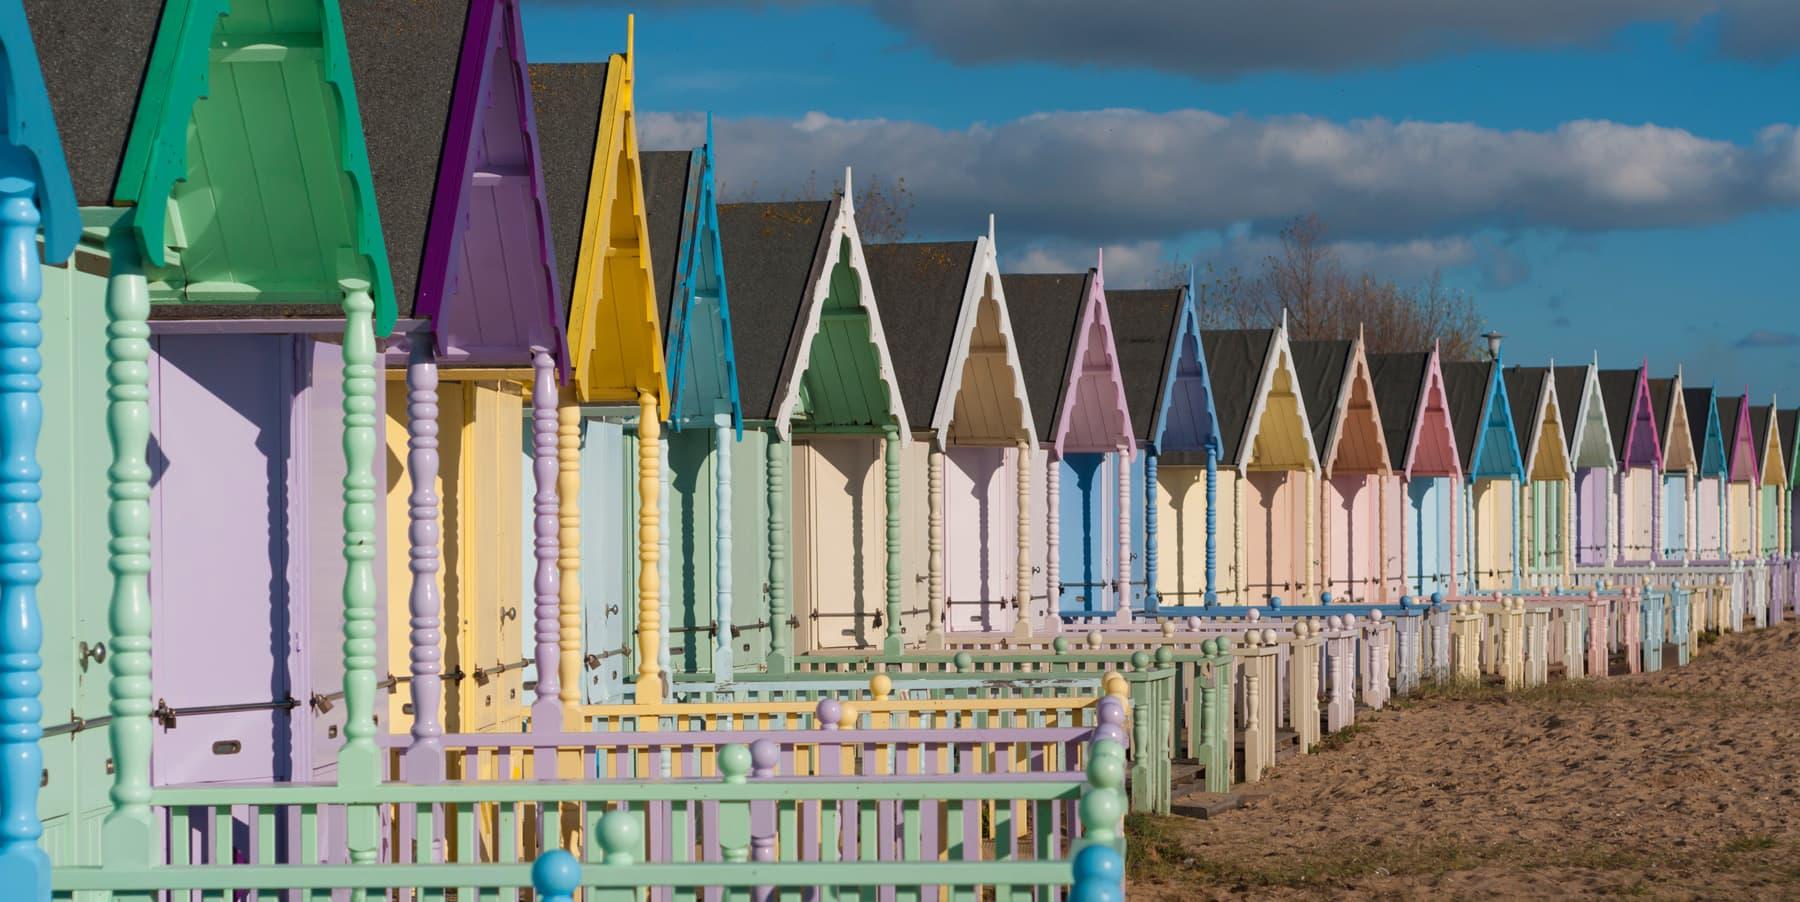 Colourful beach huts found in East Essex